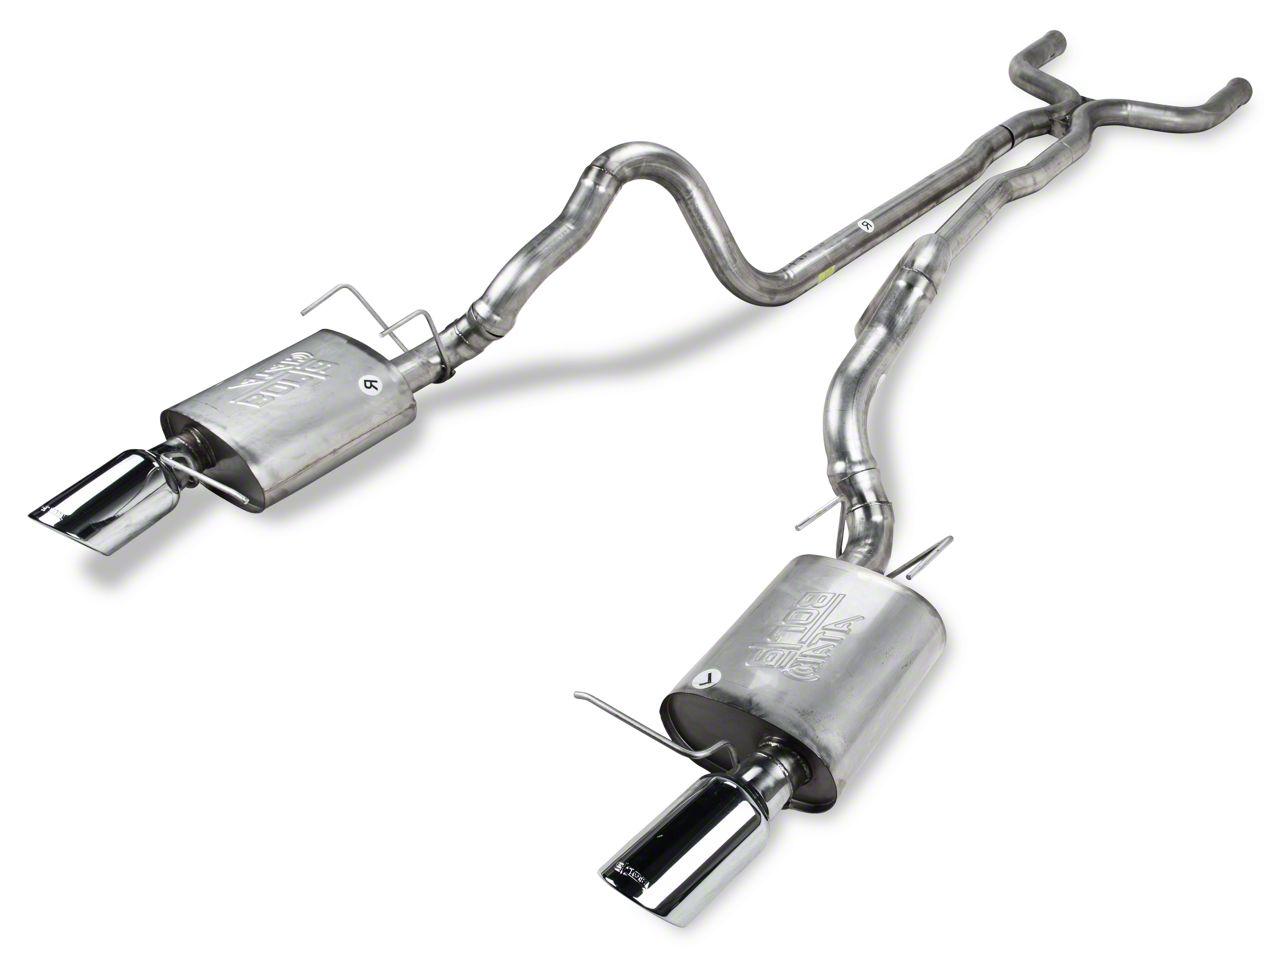 Borla 140515 Cat-Back Exhaust System